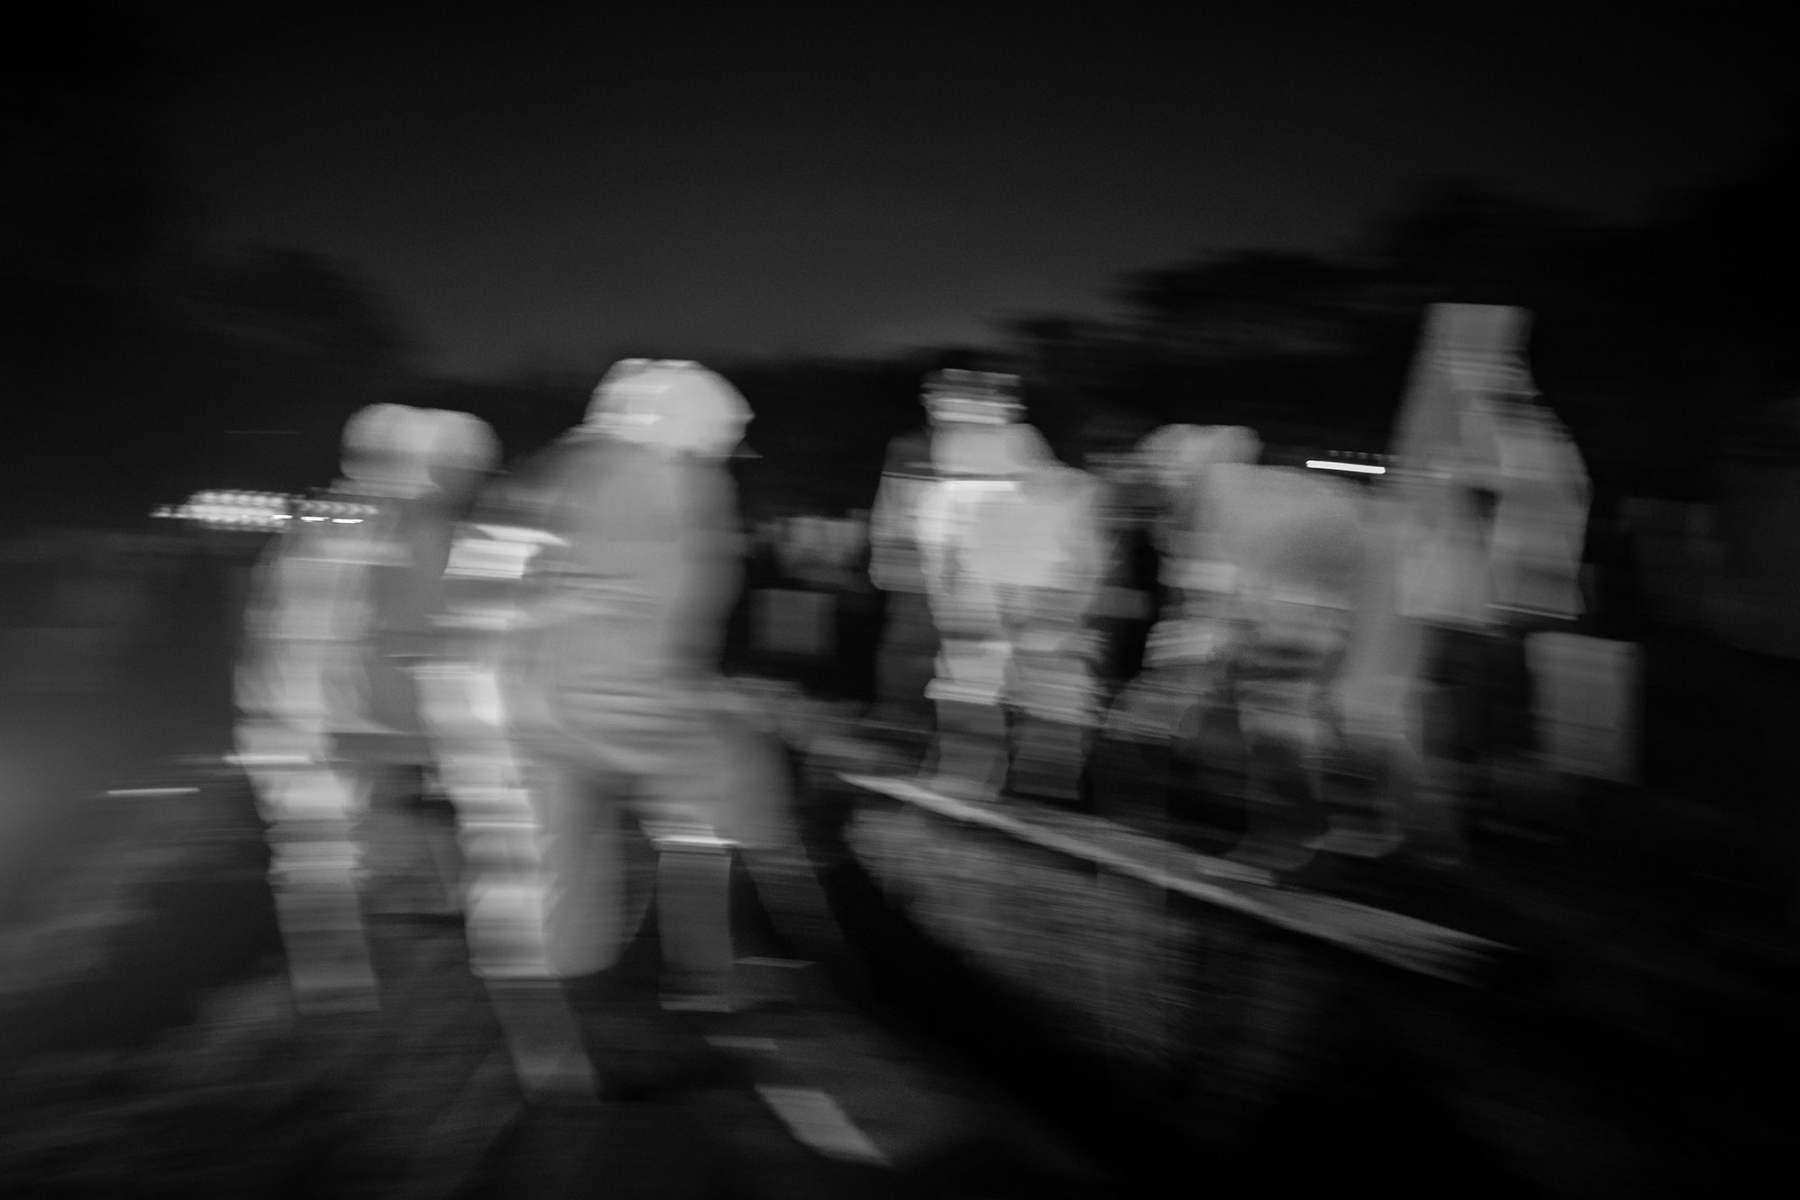 Nadi Bin Eji alias Amang bersama petugas makam lainnya saat mengubrukan jenazah COVID-19 di TPU Pondok Ranggon, Jakarta Timur.